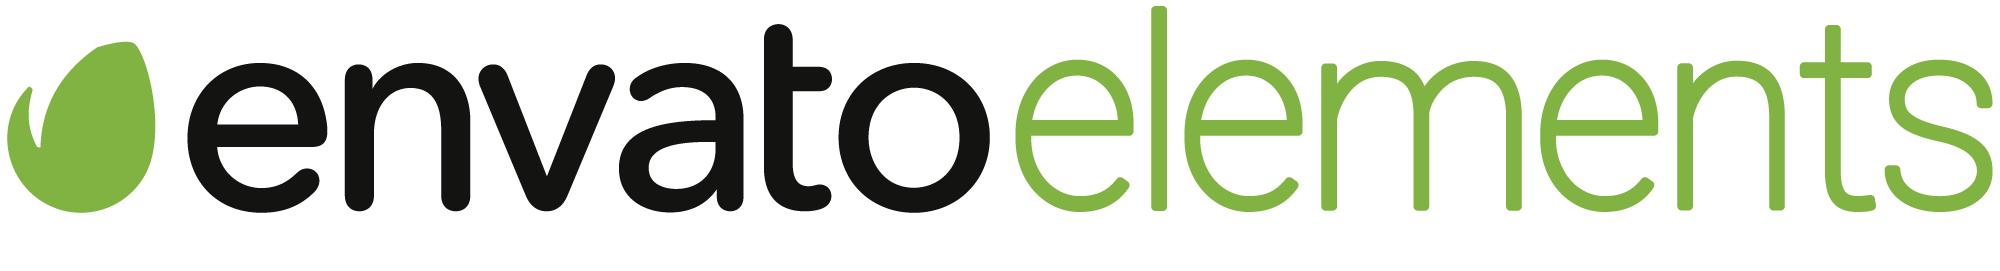 Envato Elements Logo WPism WordPress